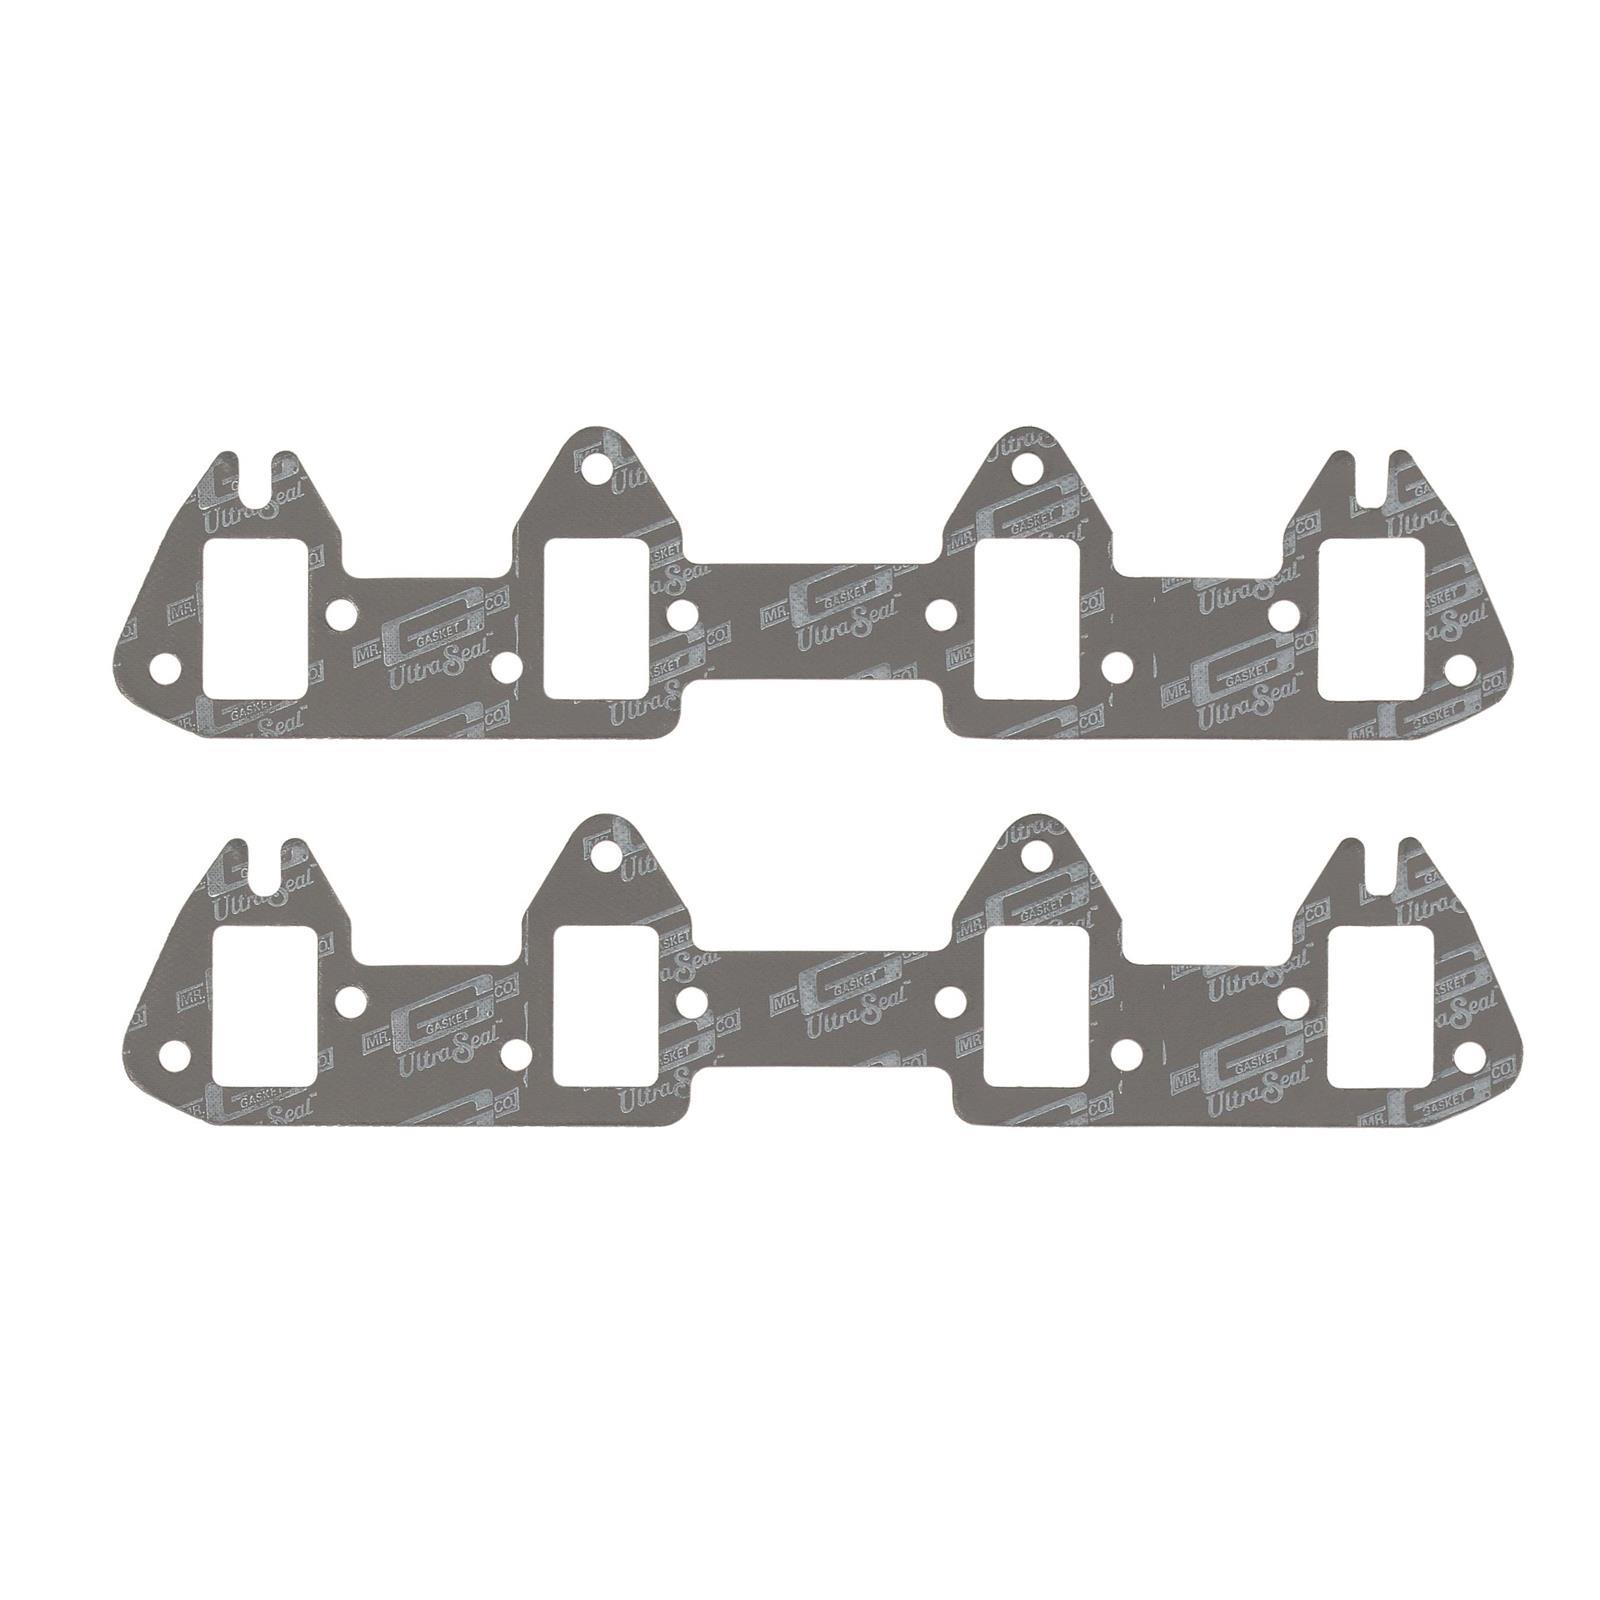 2 Per Set Mr Gasket 5930 Ultra-Seal Exhaust Manifold Gaskets